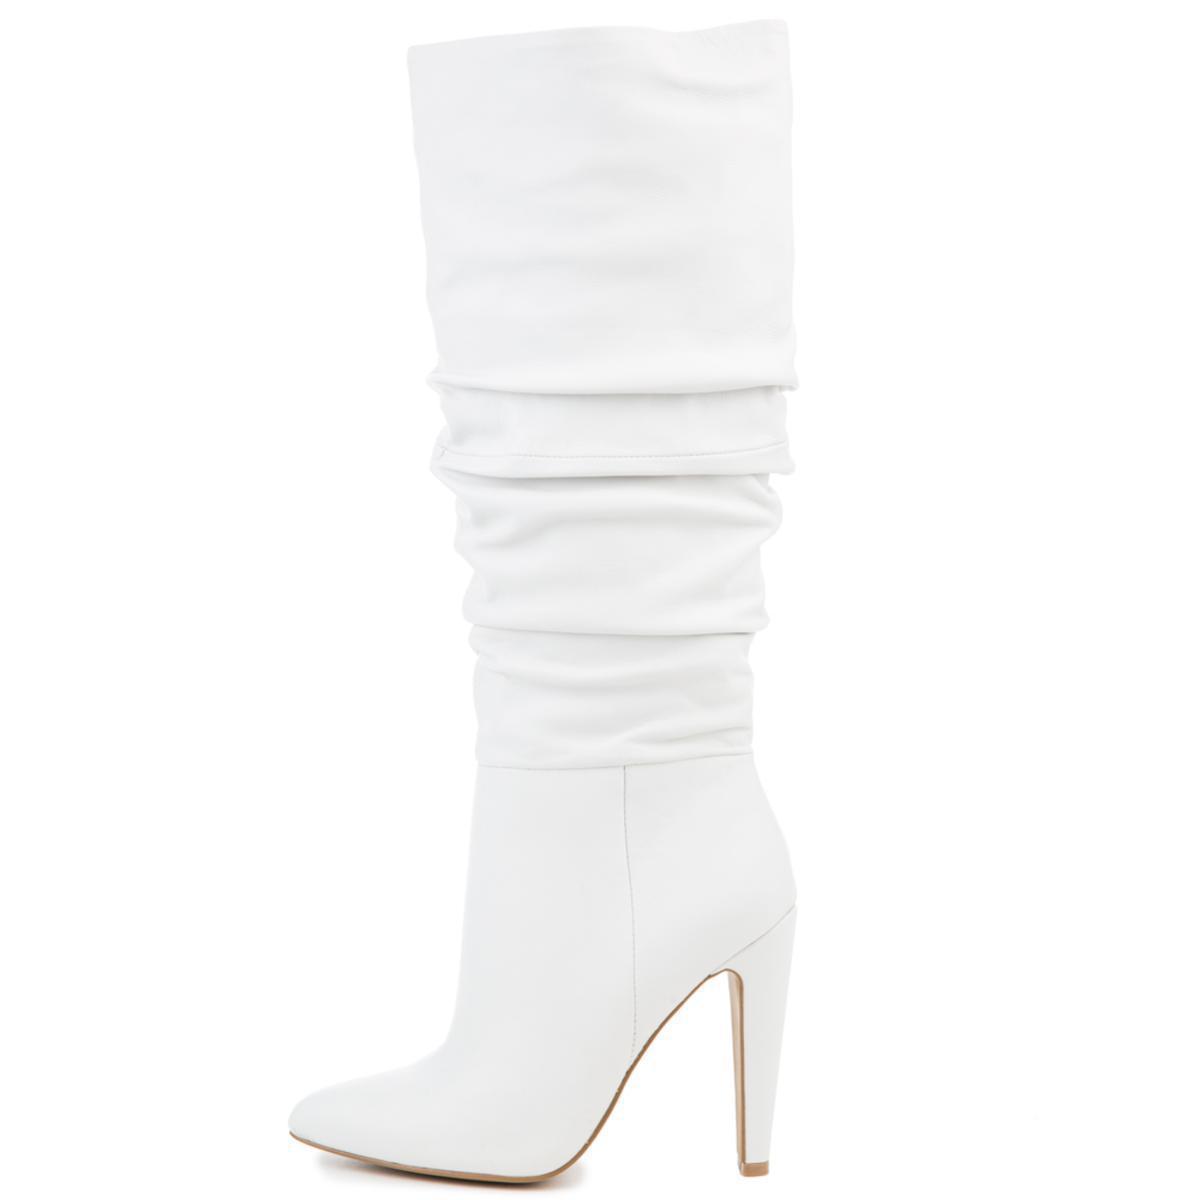 8754497c70e Lyst - Steve Madden Carrie 105 White Heeled Boots in White